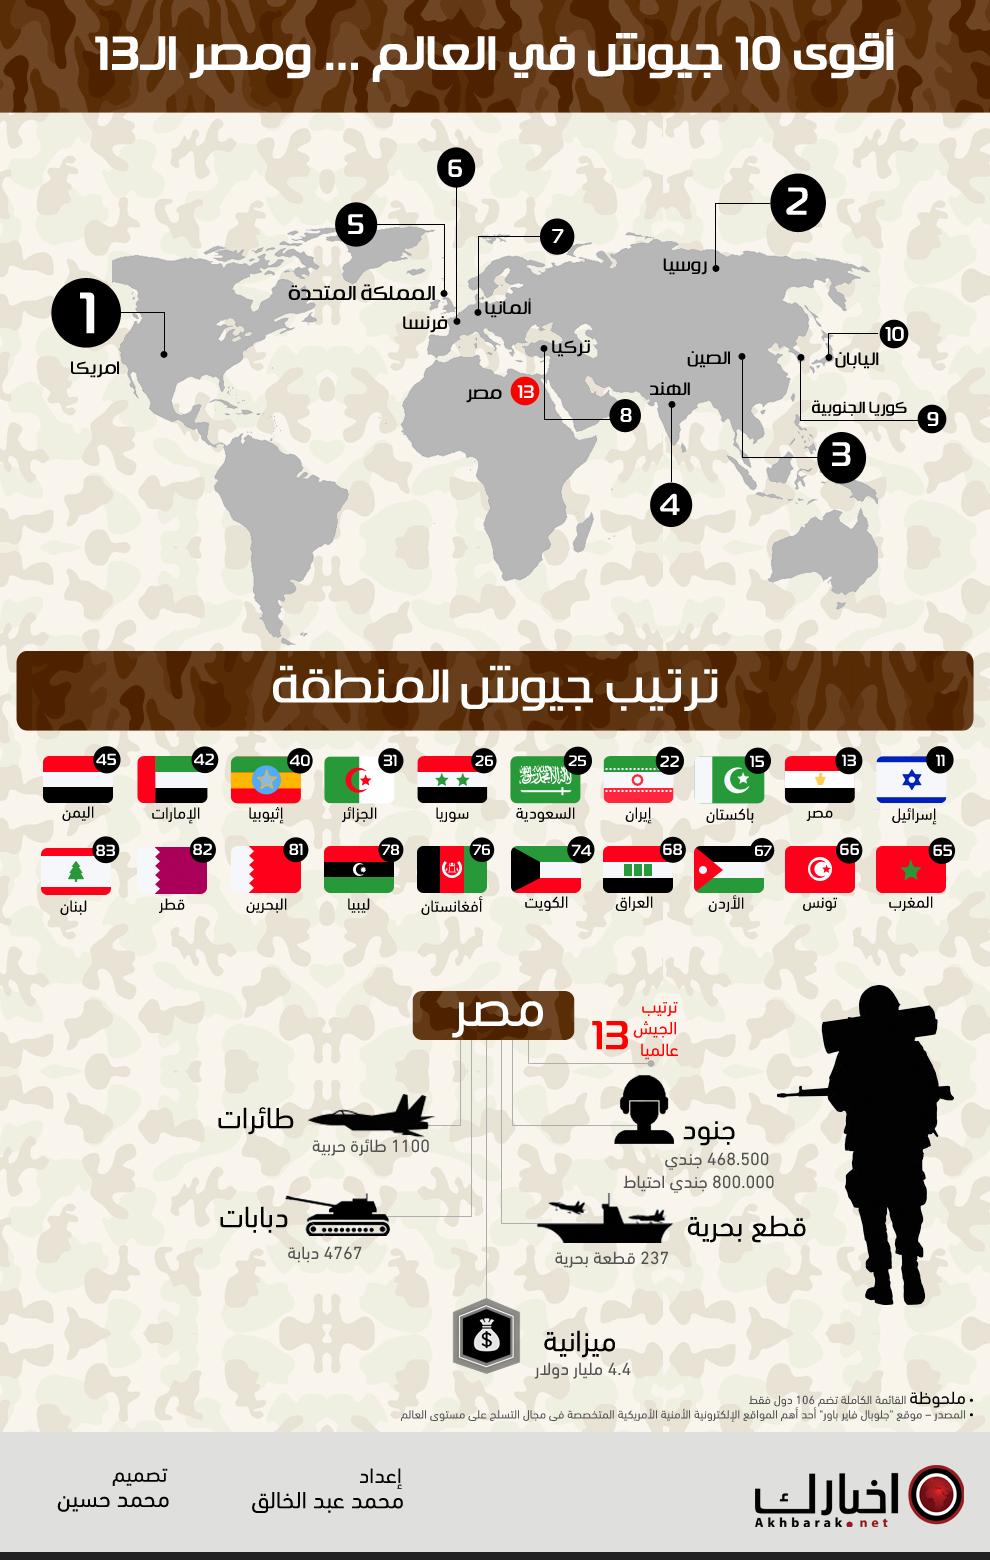 أقوى جيوش العالم ومصر في المركز 13 Infographic Places To Visit Remember